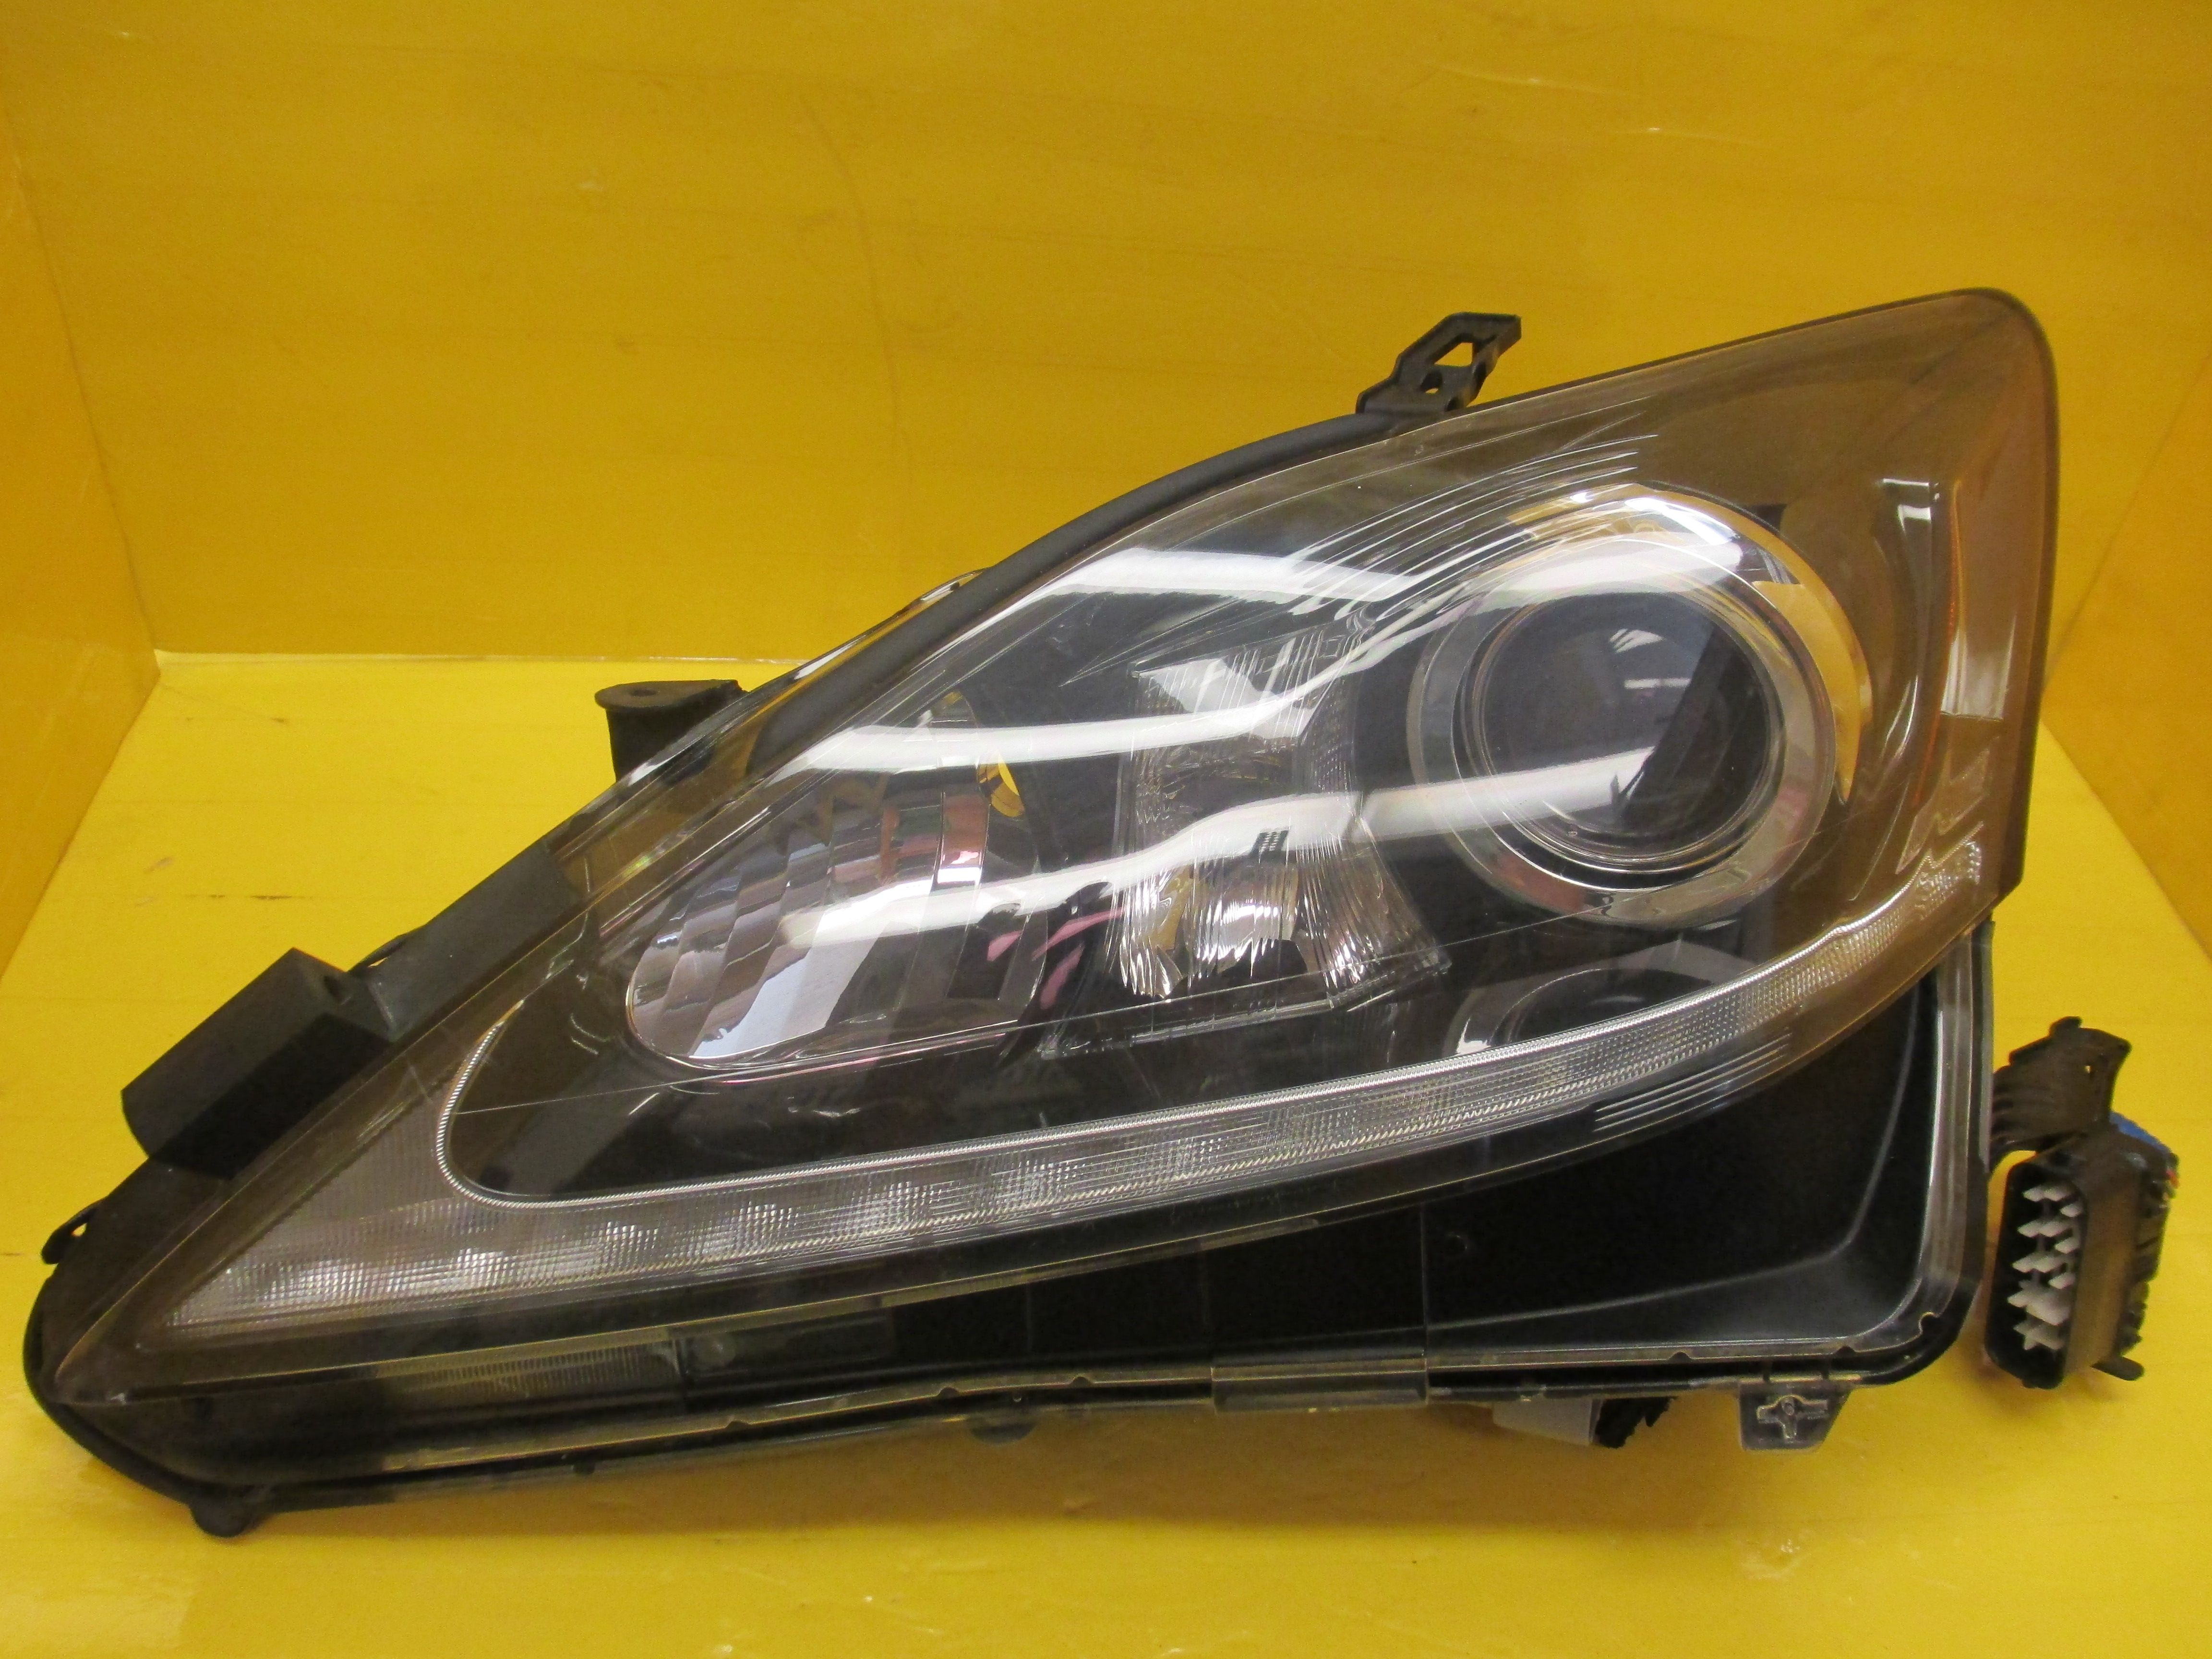 retrofit santos limited jake rjm bionic headlight lexus projector is large on installed quad